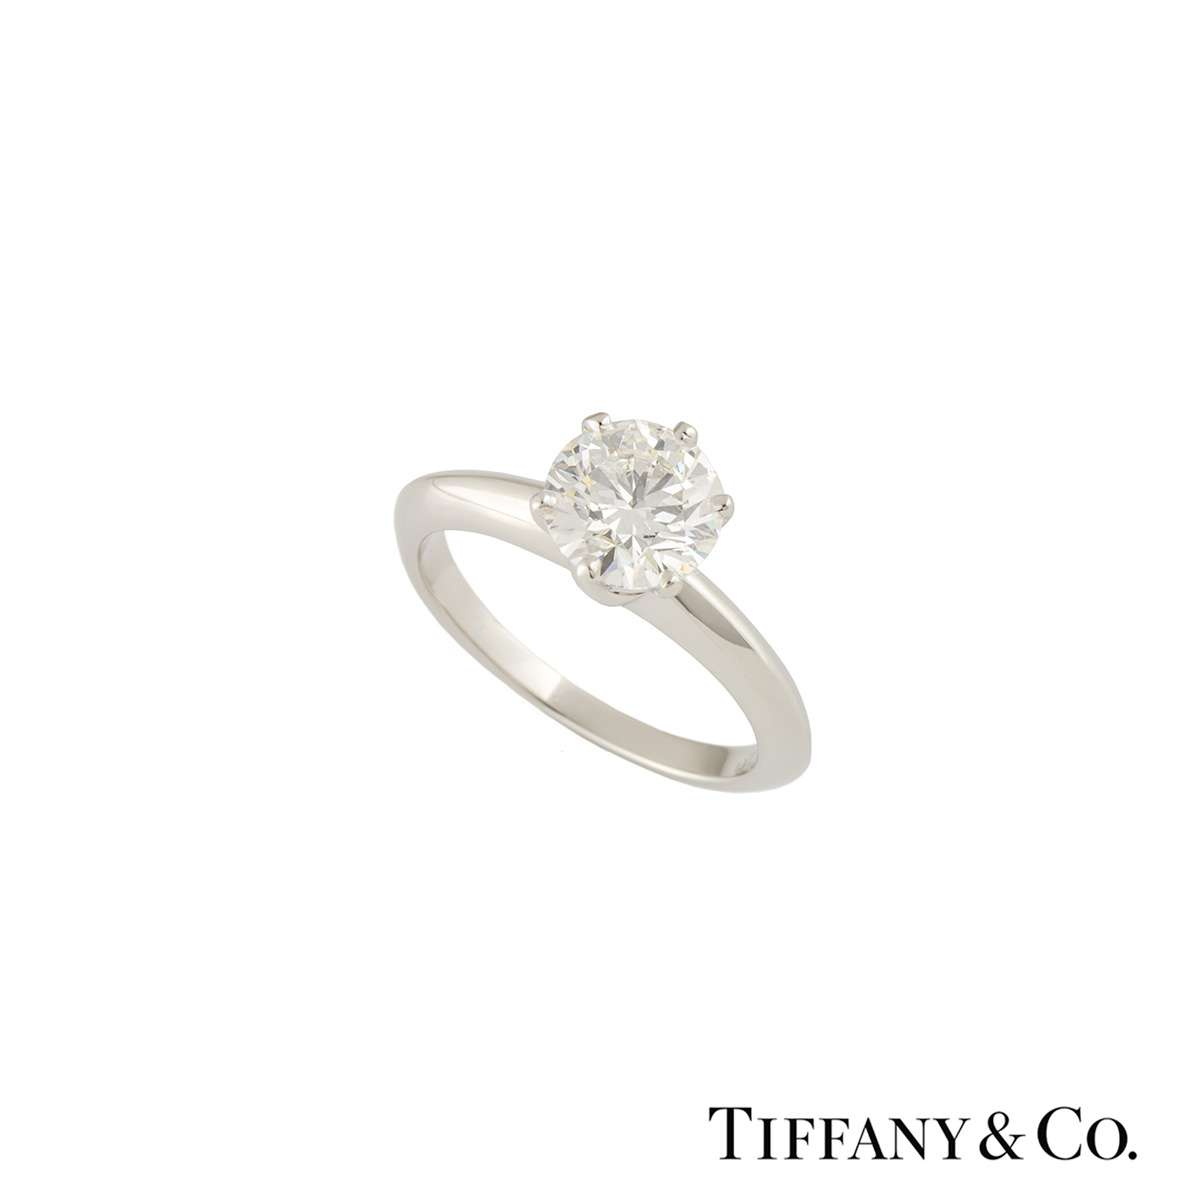 Tiffany & Co. Platinum Diamond Setting Band Ring 1.37ct I/VVS2